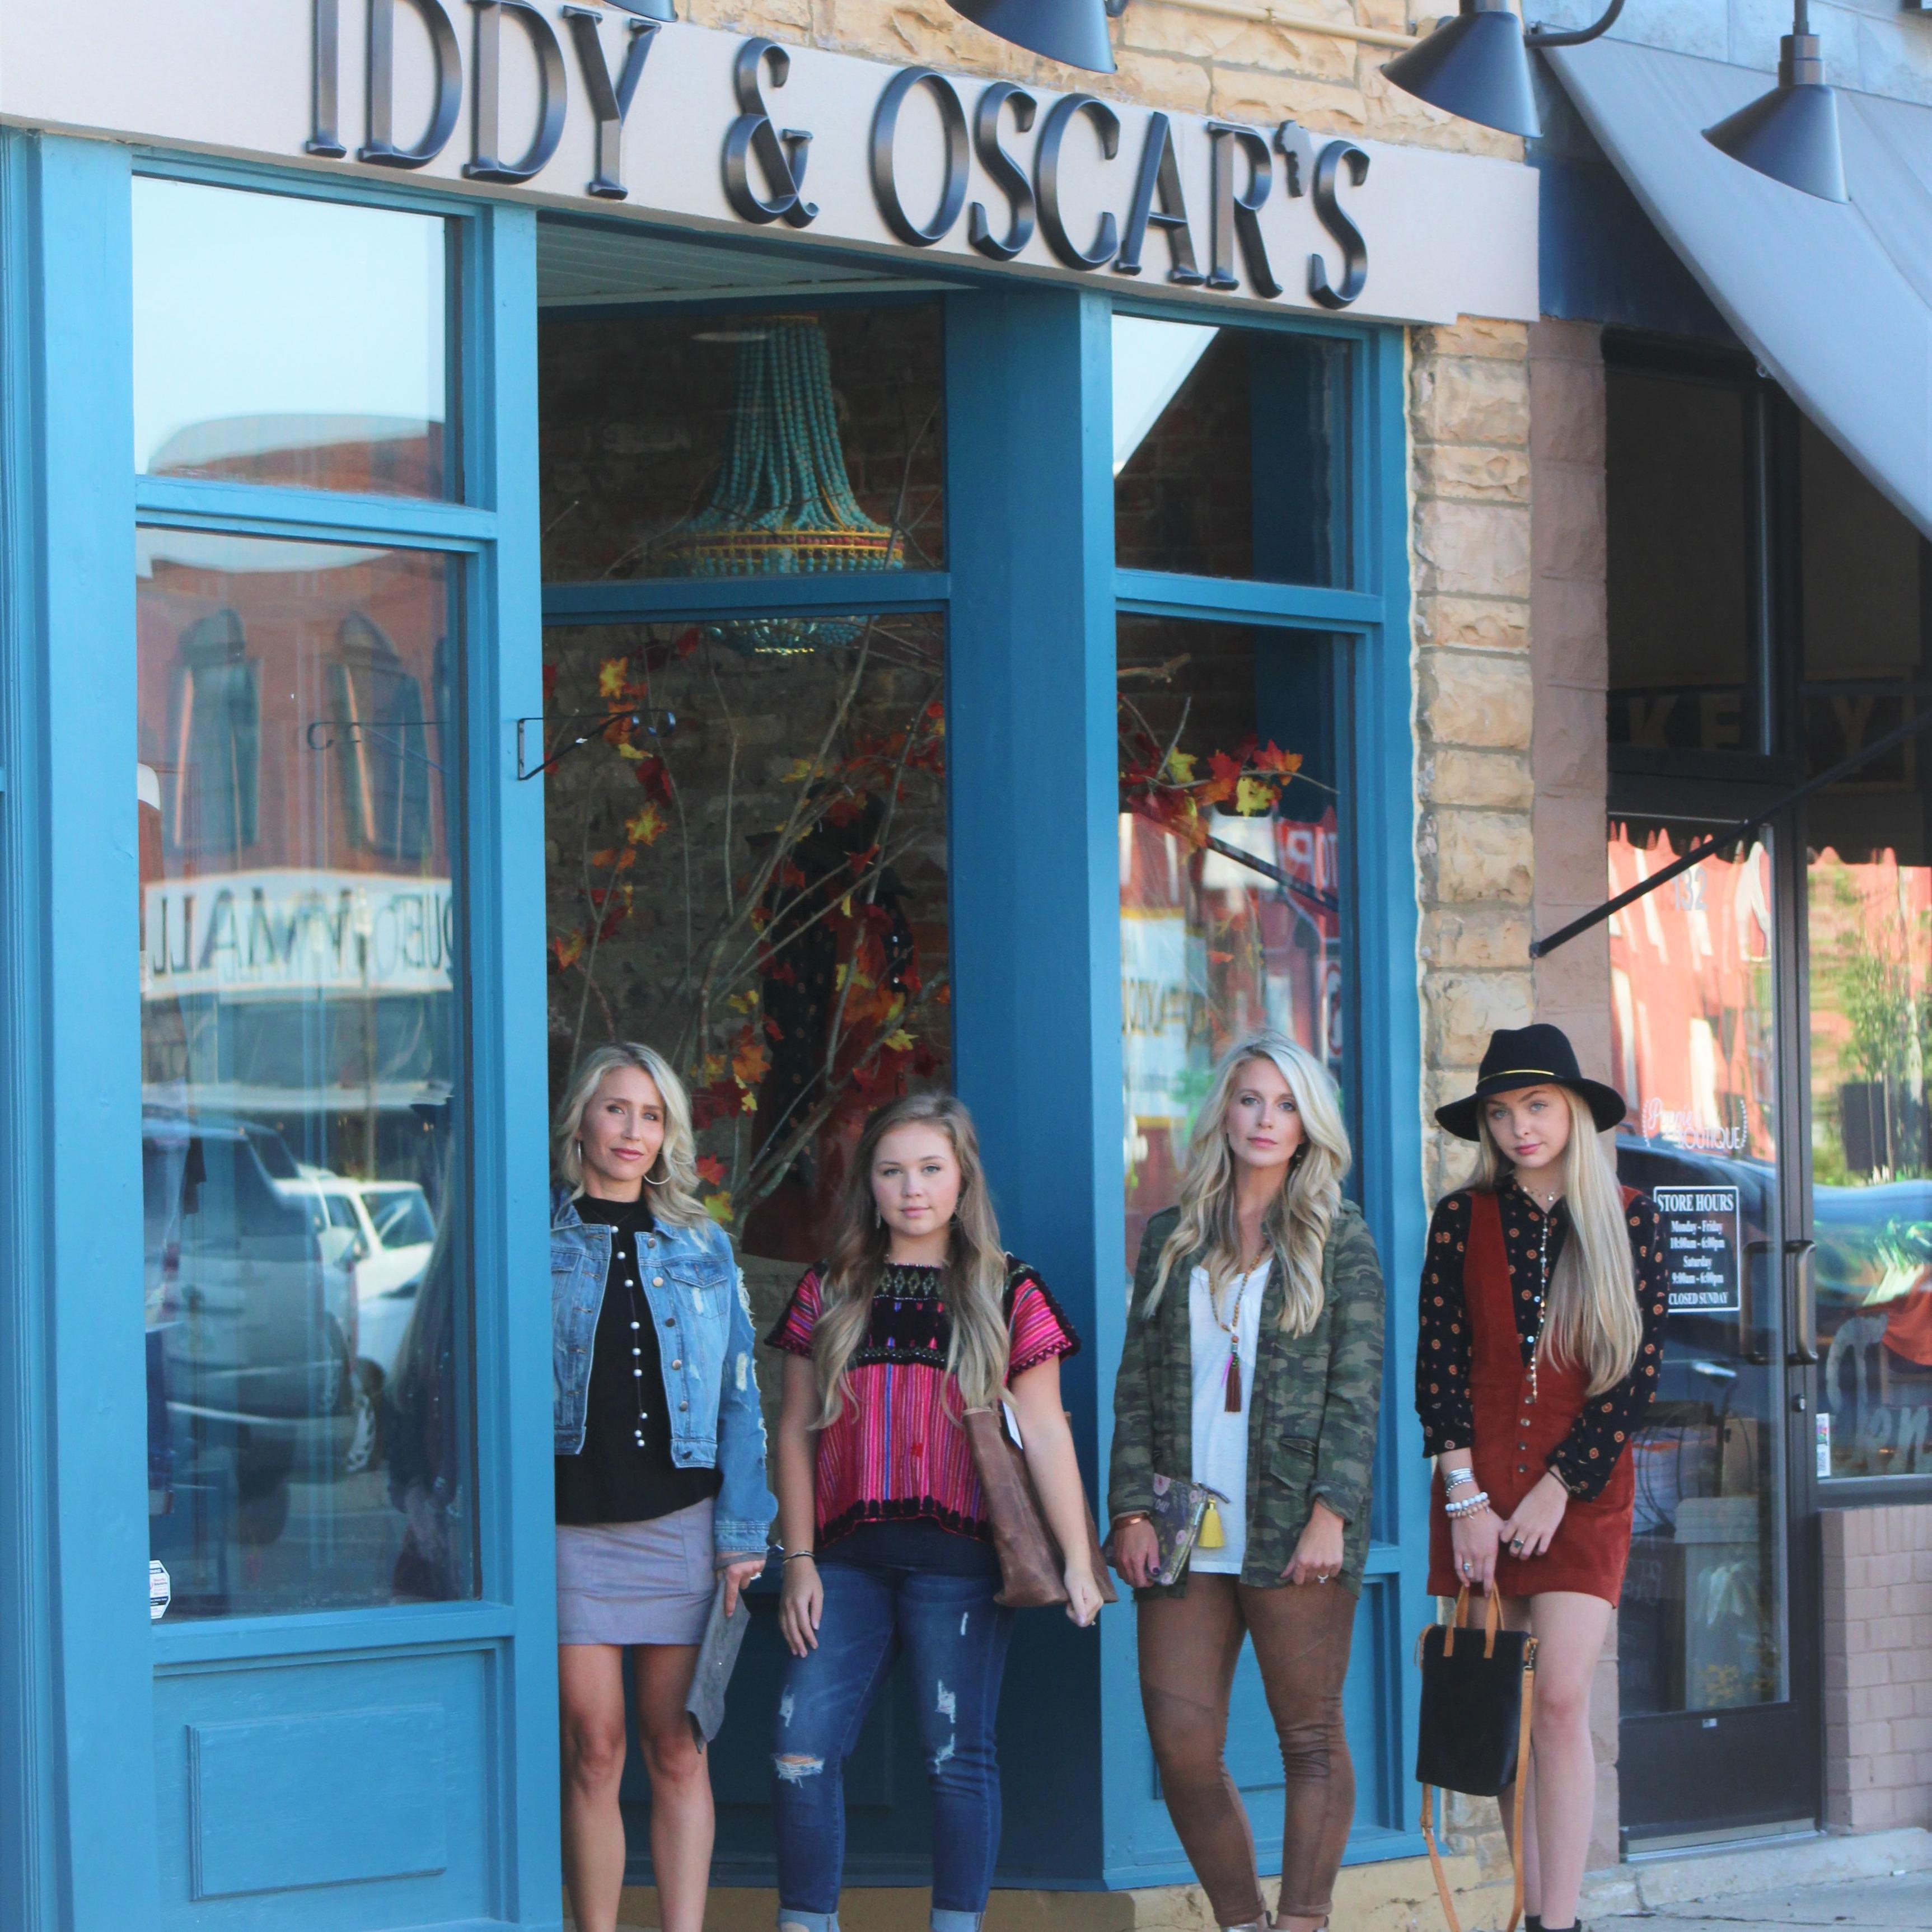 Iddy & Oscar's